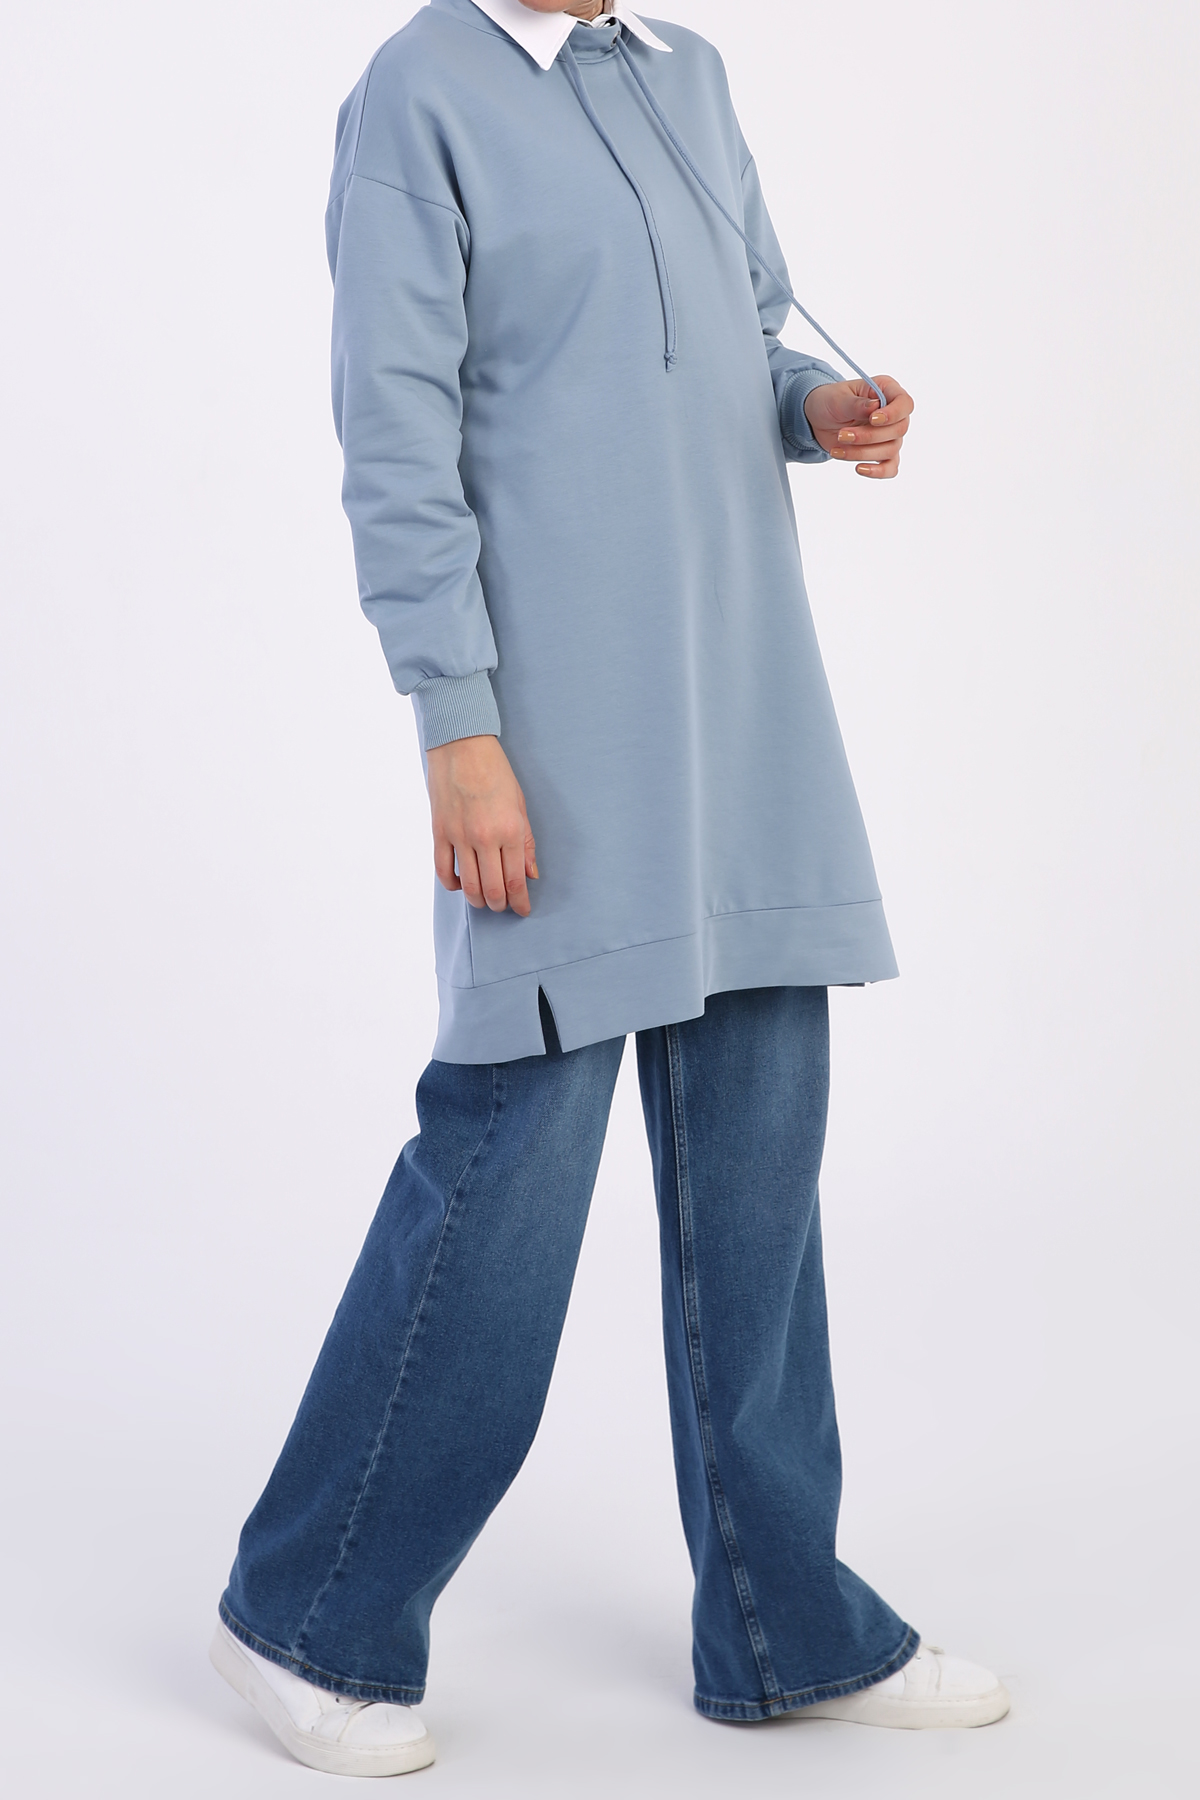 Stand -away Collar Comfy Sweatshirt Tunic